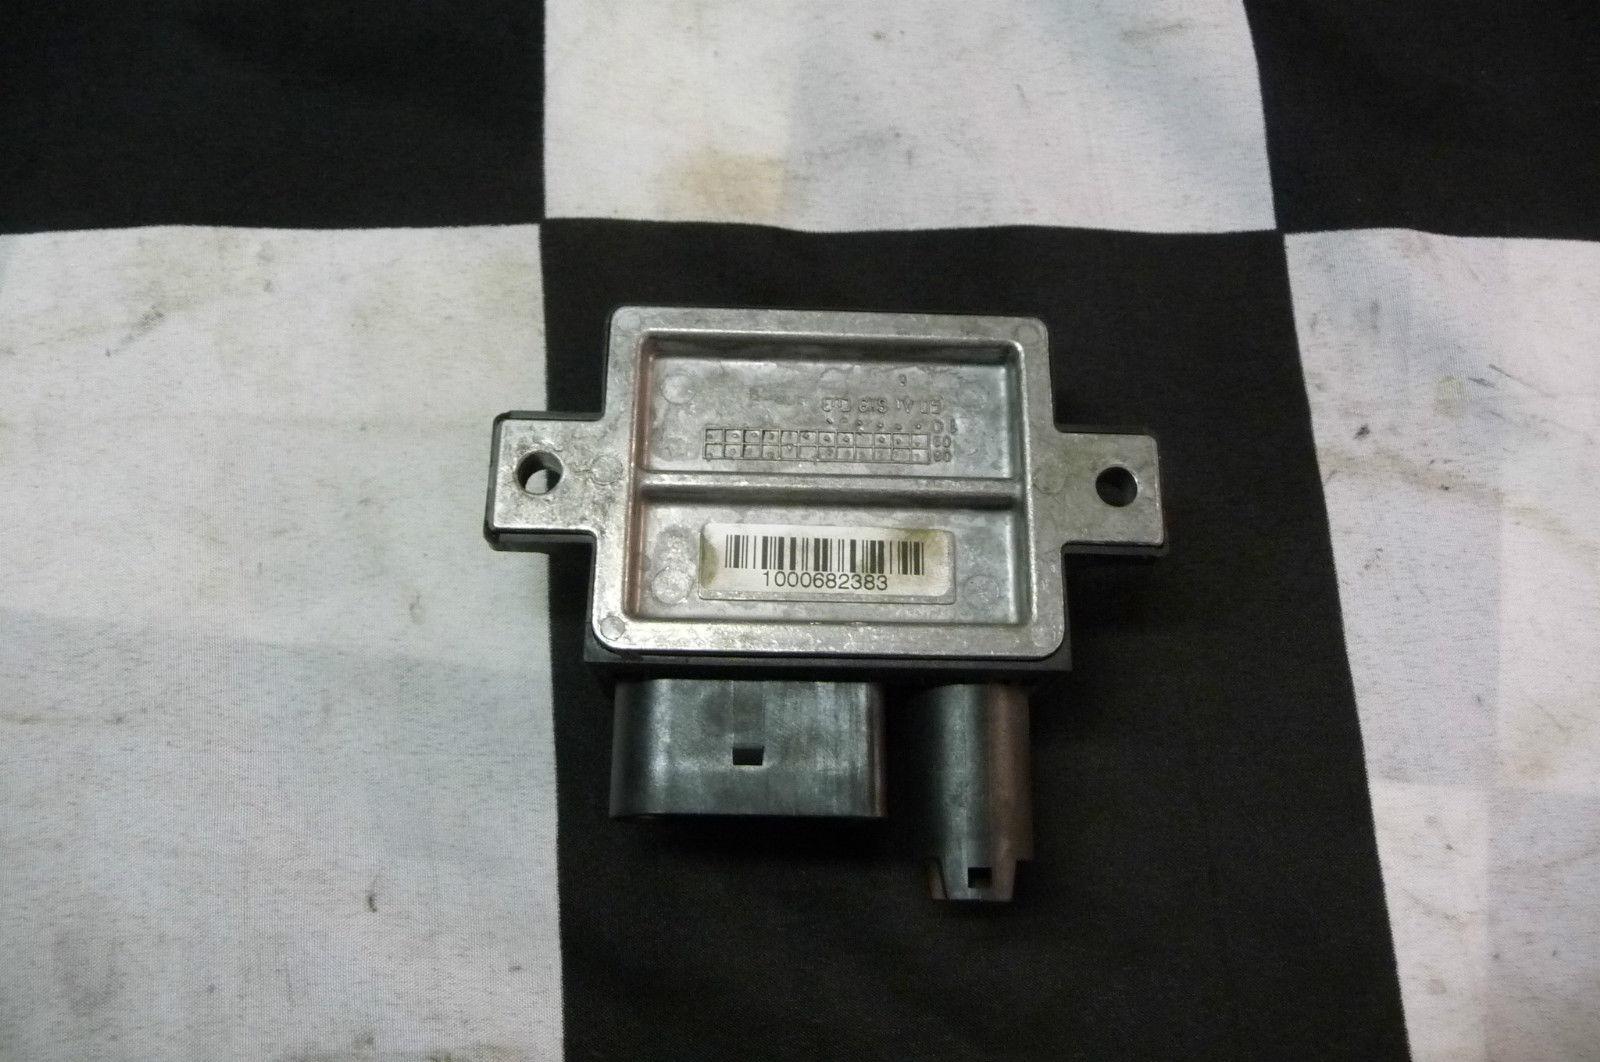 BMW 3 Series X5 Diesel Glow Plug Switch Preheating Control Unit 12217800156 OEM